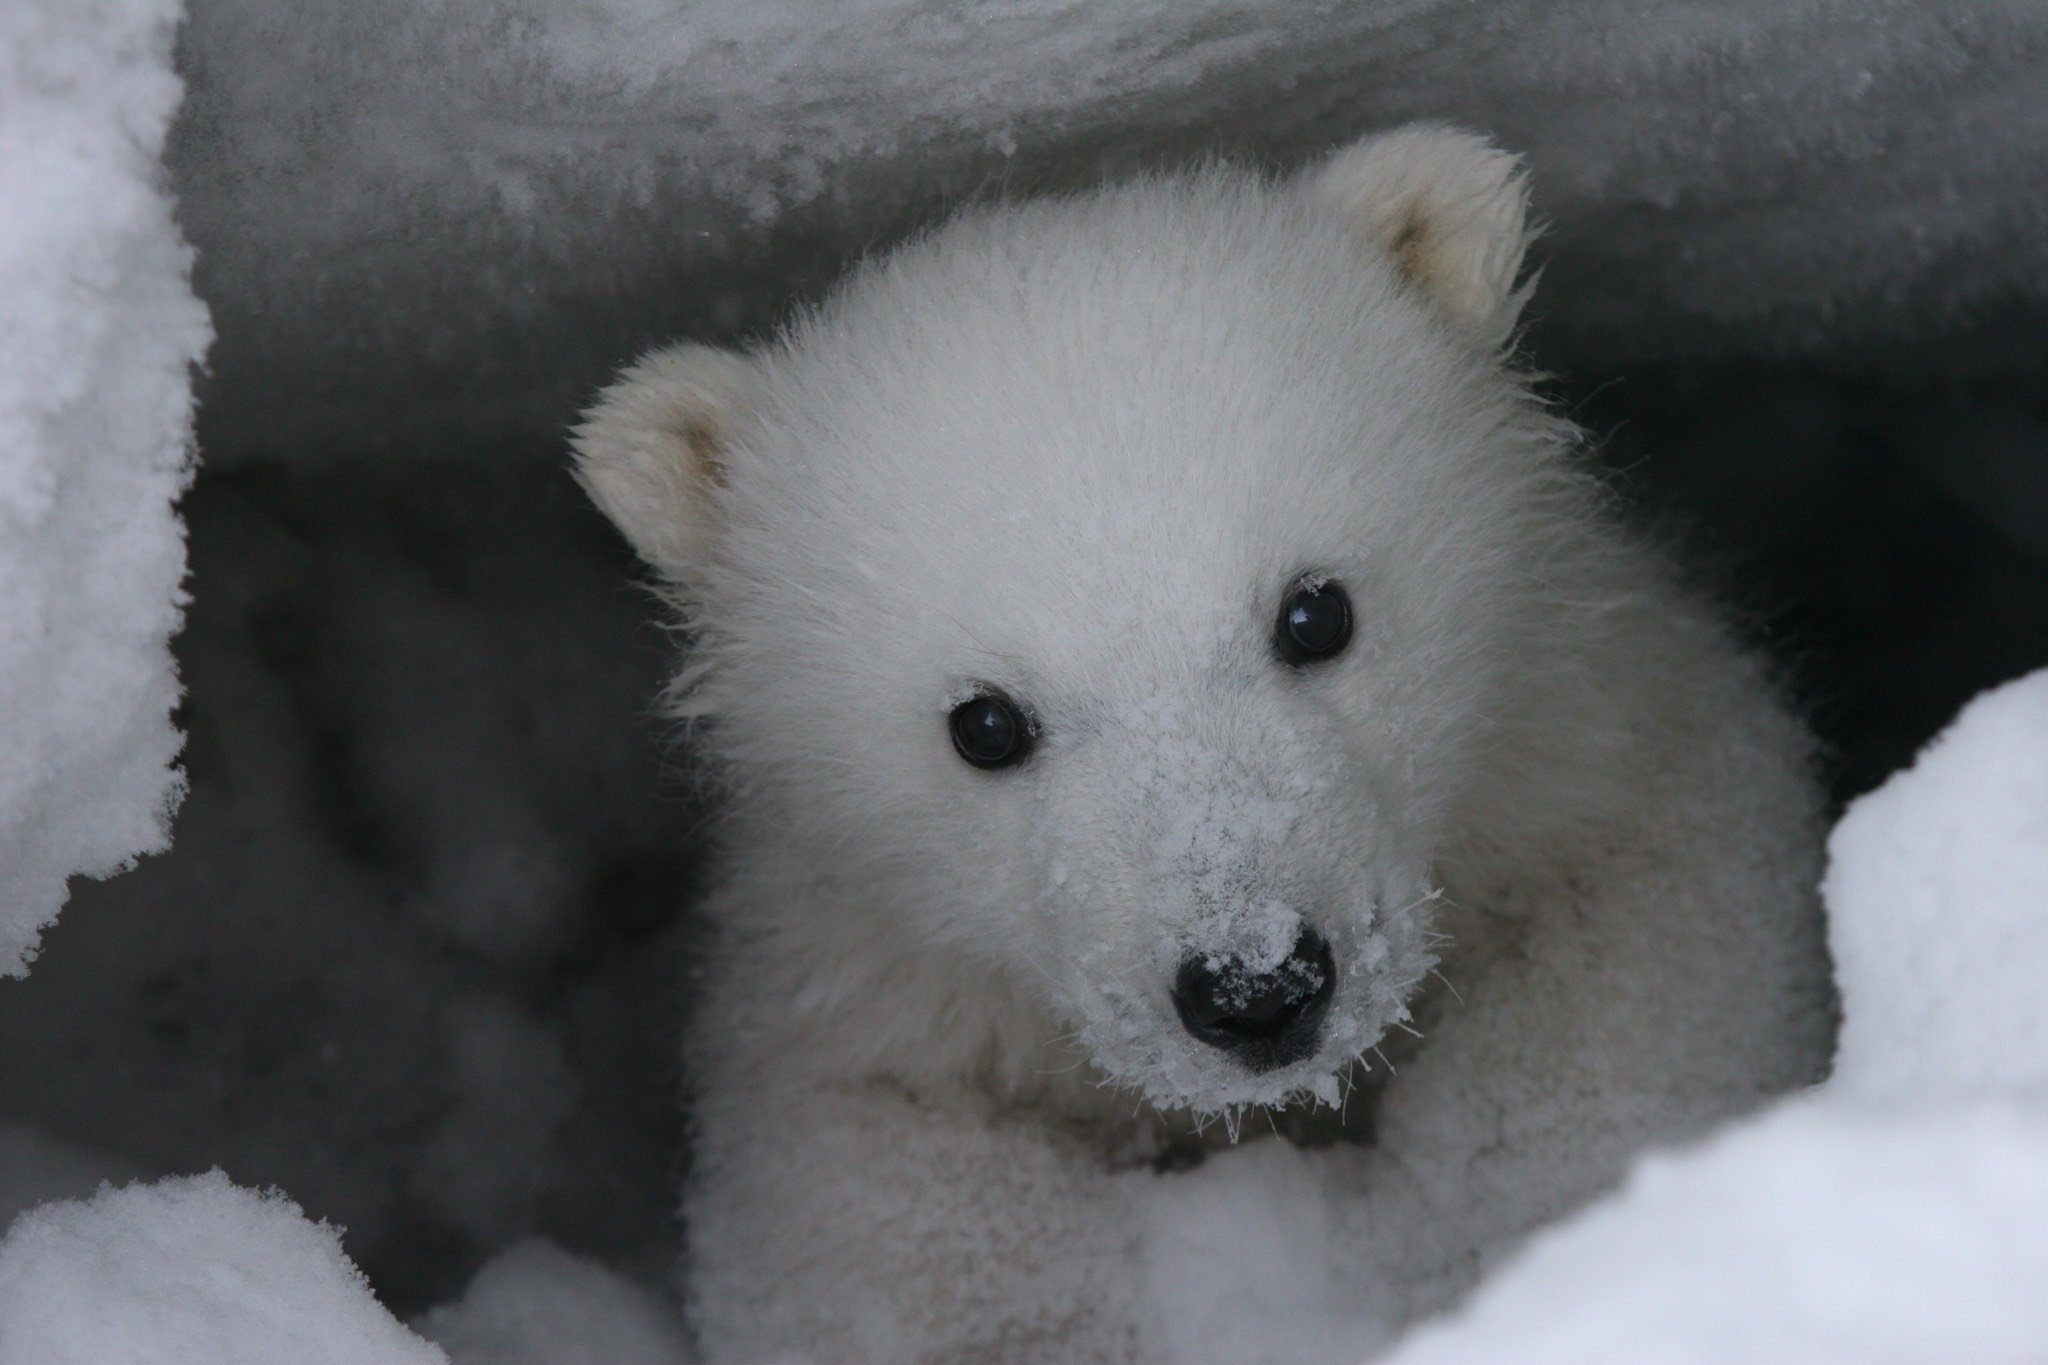 Legislation seeks to protect polar bear denning habitat in Arctic refuge - ArcticToday